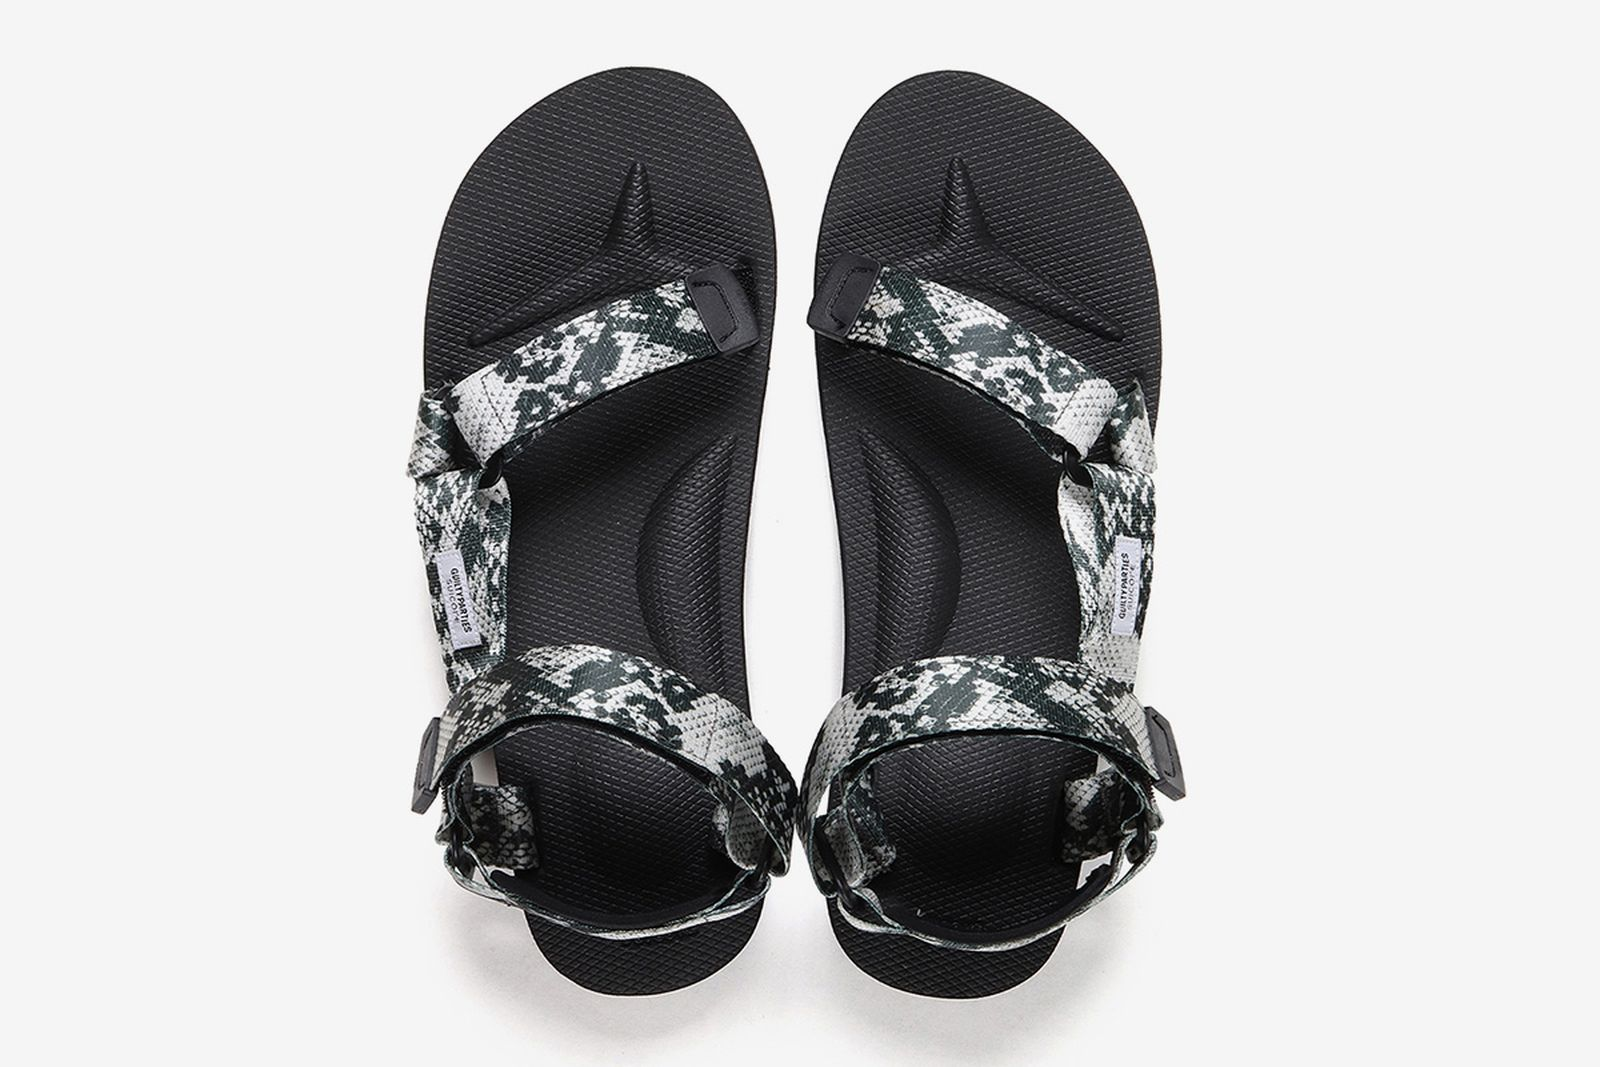 wacko-maria-suicoke-sandals-release-date-price-04